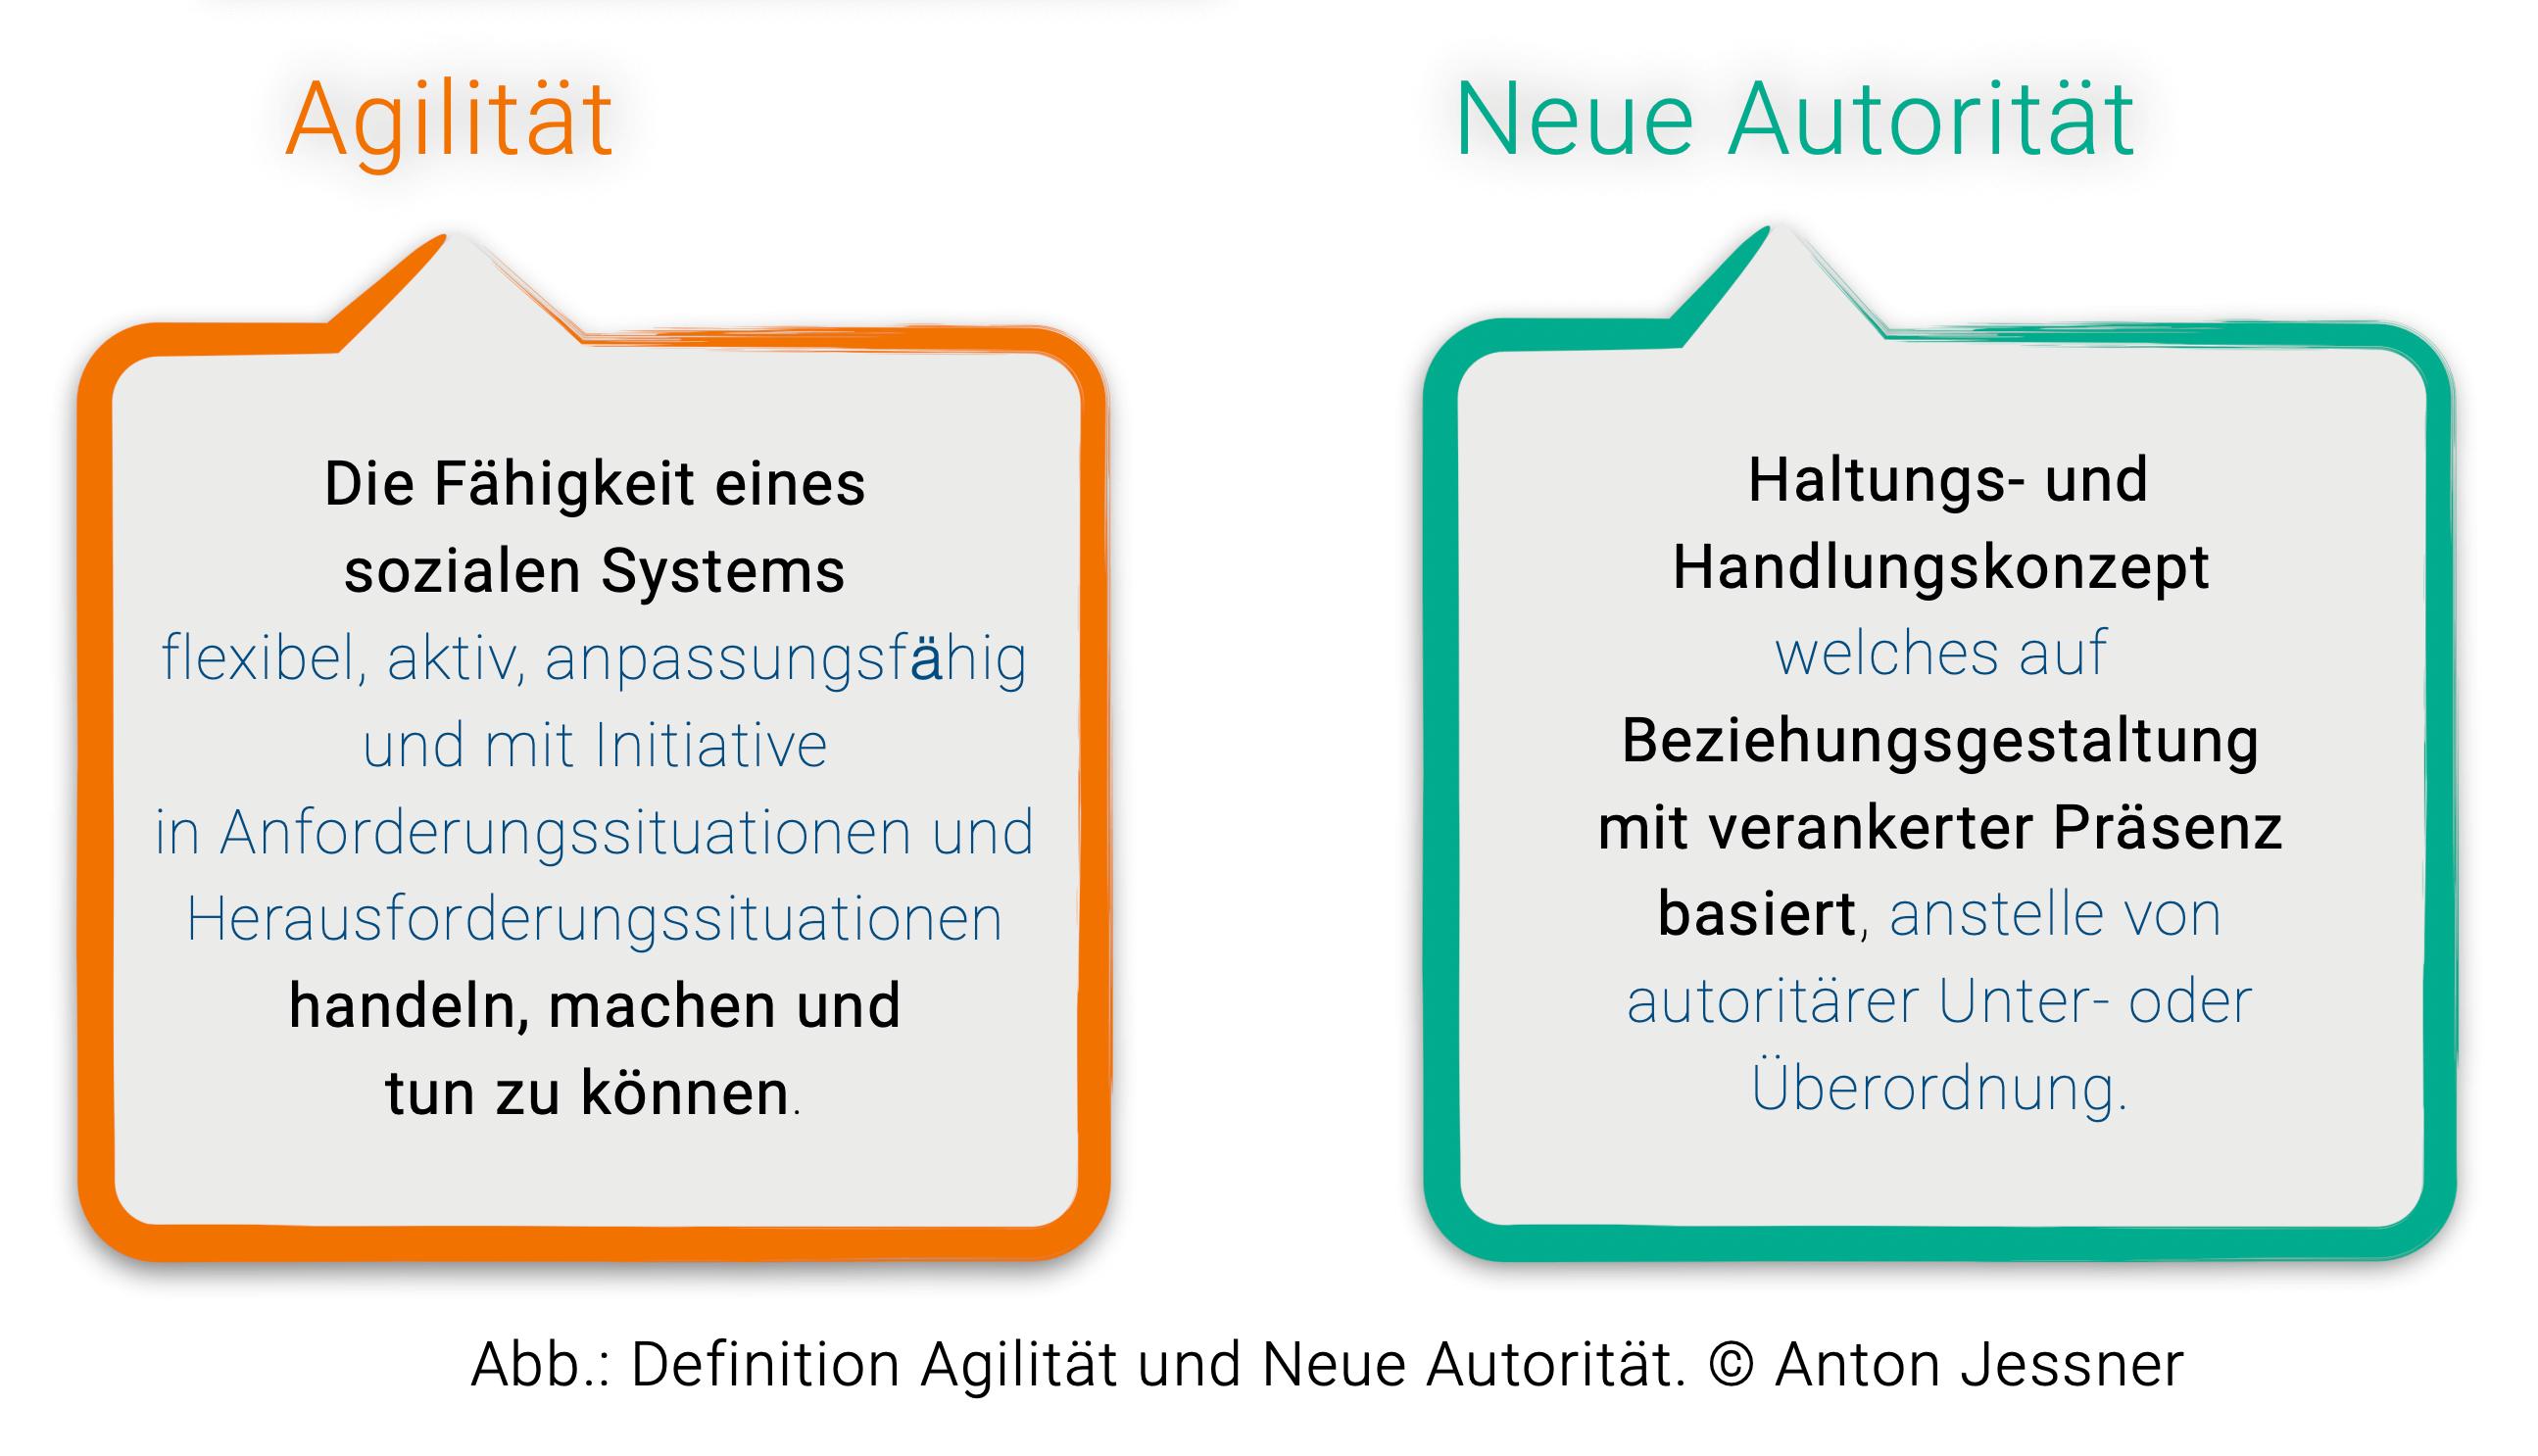 Abb.: Definition Agilität und Neue Autorität - © Anton Jessner